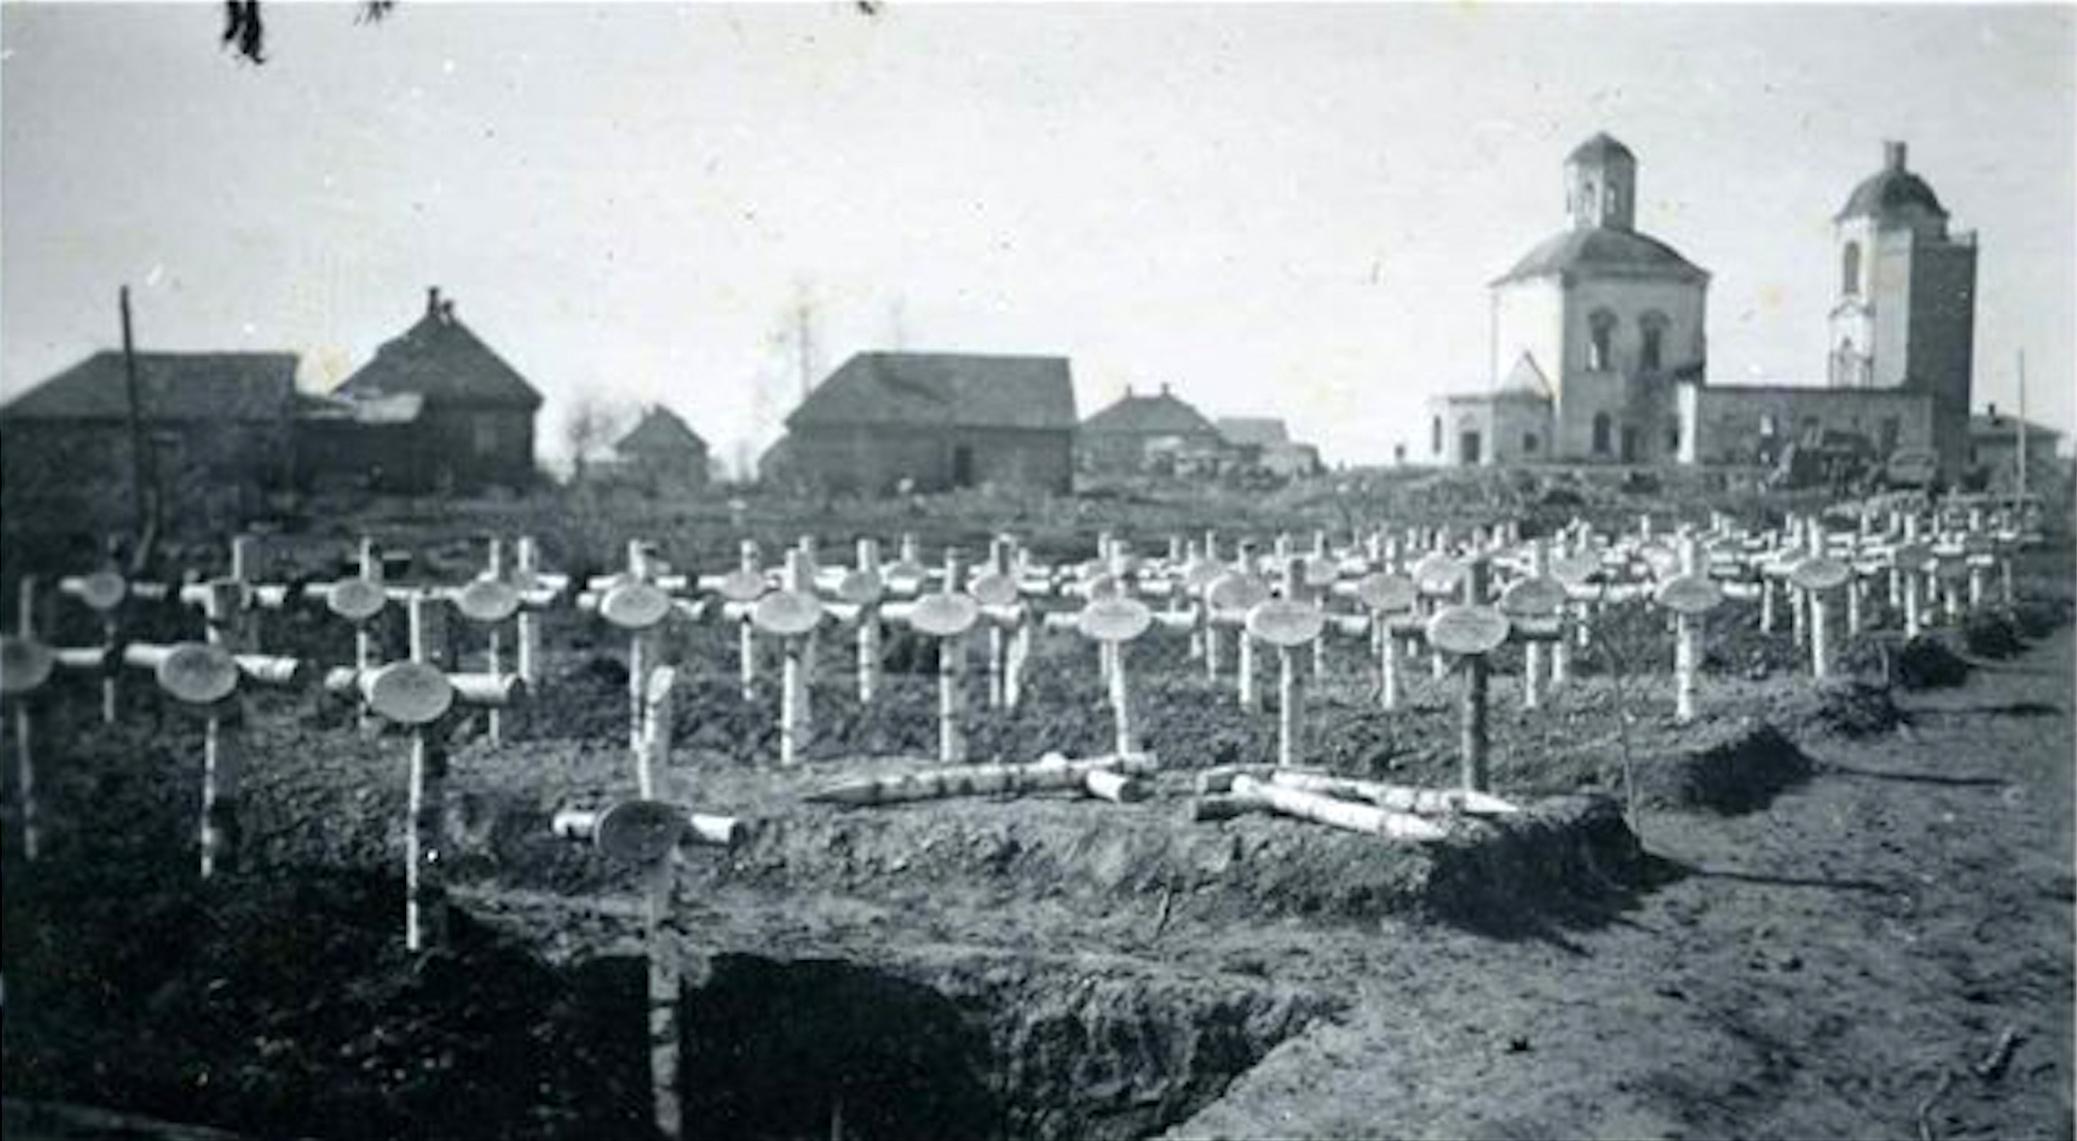 kladbishhe-gitlerovskoi-divizii-elninskaya-duga-1941g-1-png